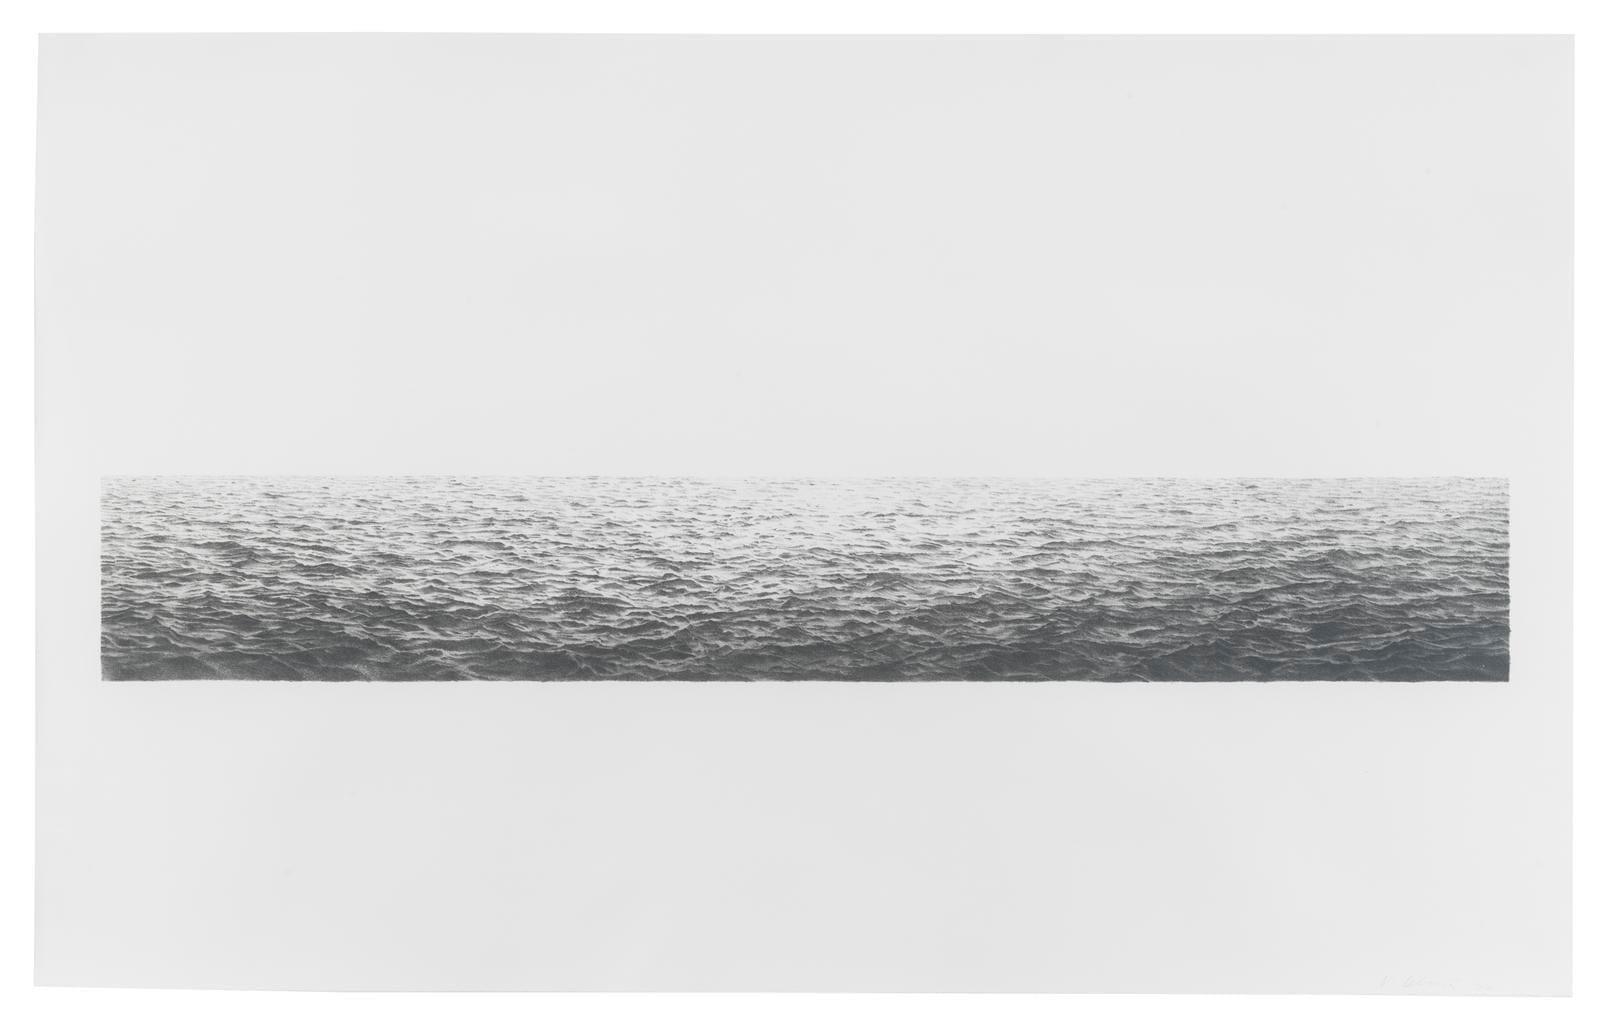 Untitled (Large Ocean), 1972